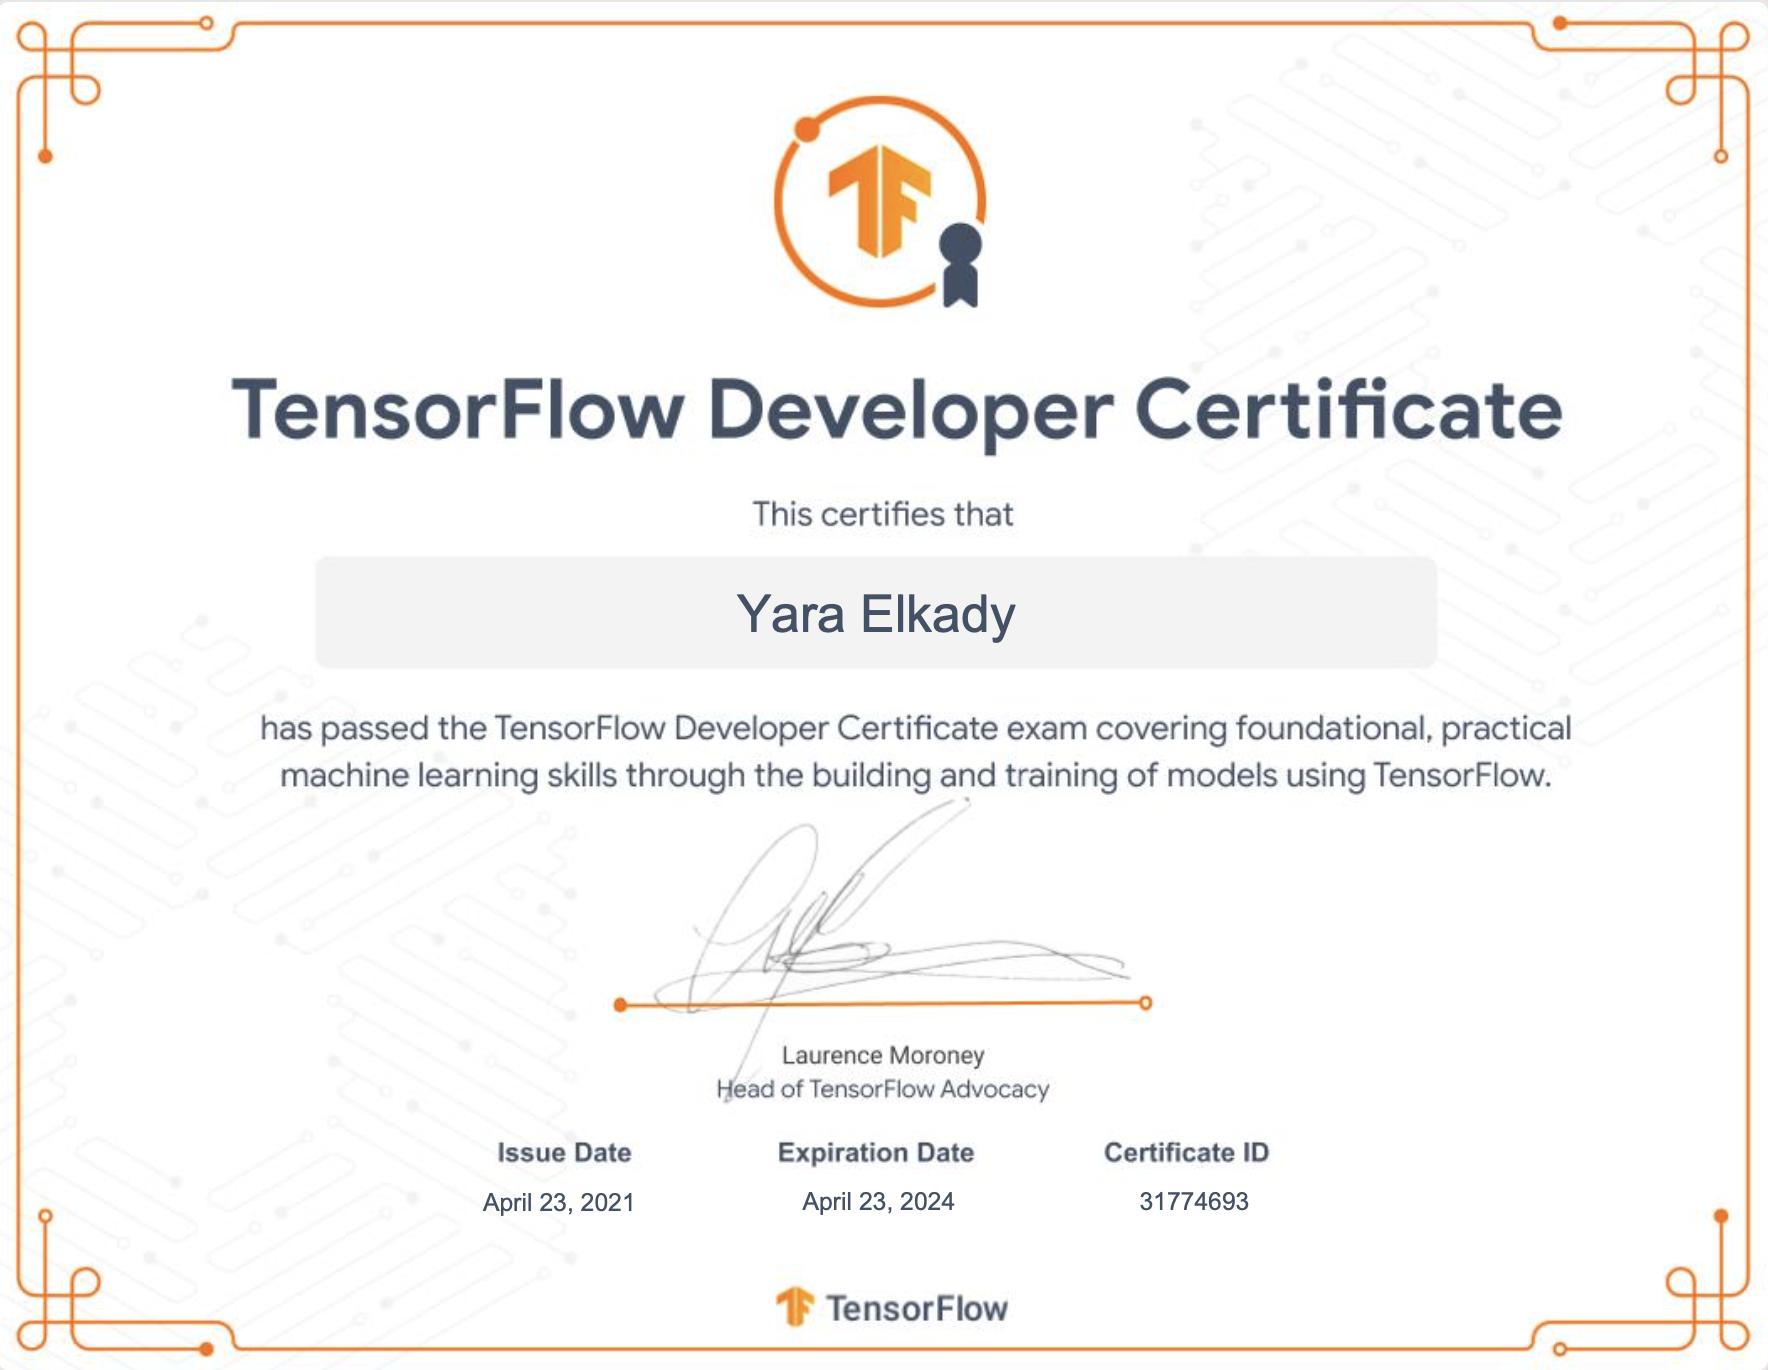 Image of Yara Elkady's TensorFlow Developer Certificate